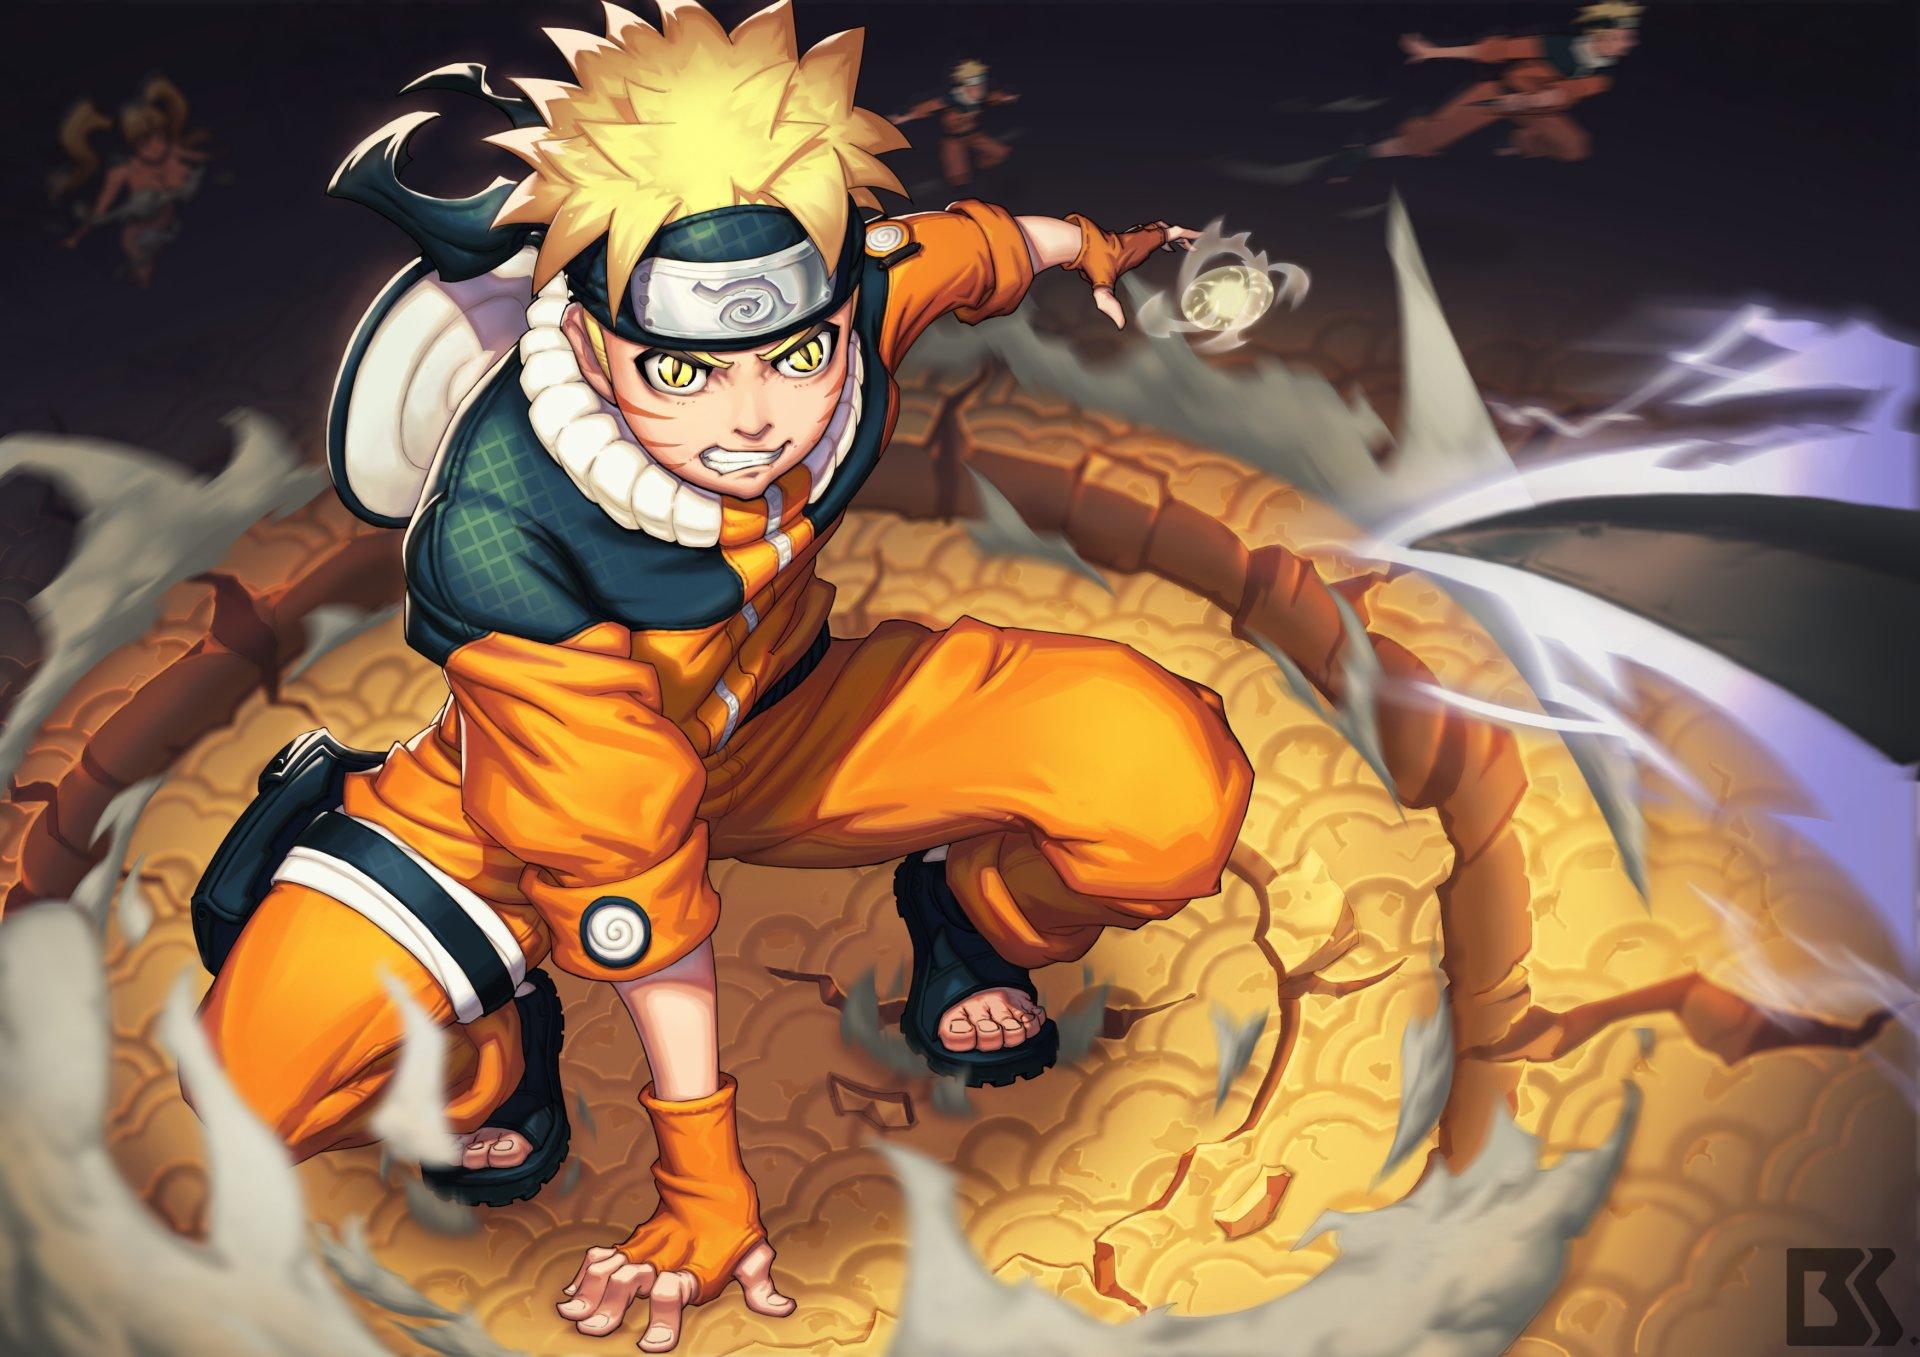 Naruto Fond d'écran HD | Arrière-Plan | 3508x2480 | ID:1064873 - Wallpaper Abyss